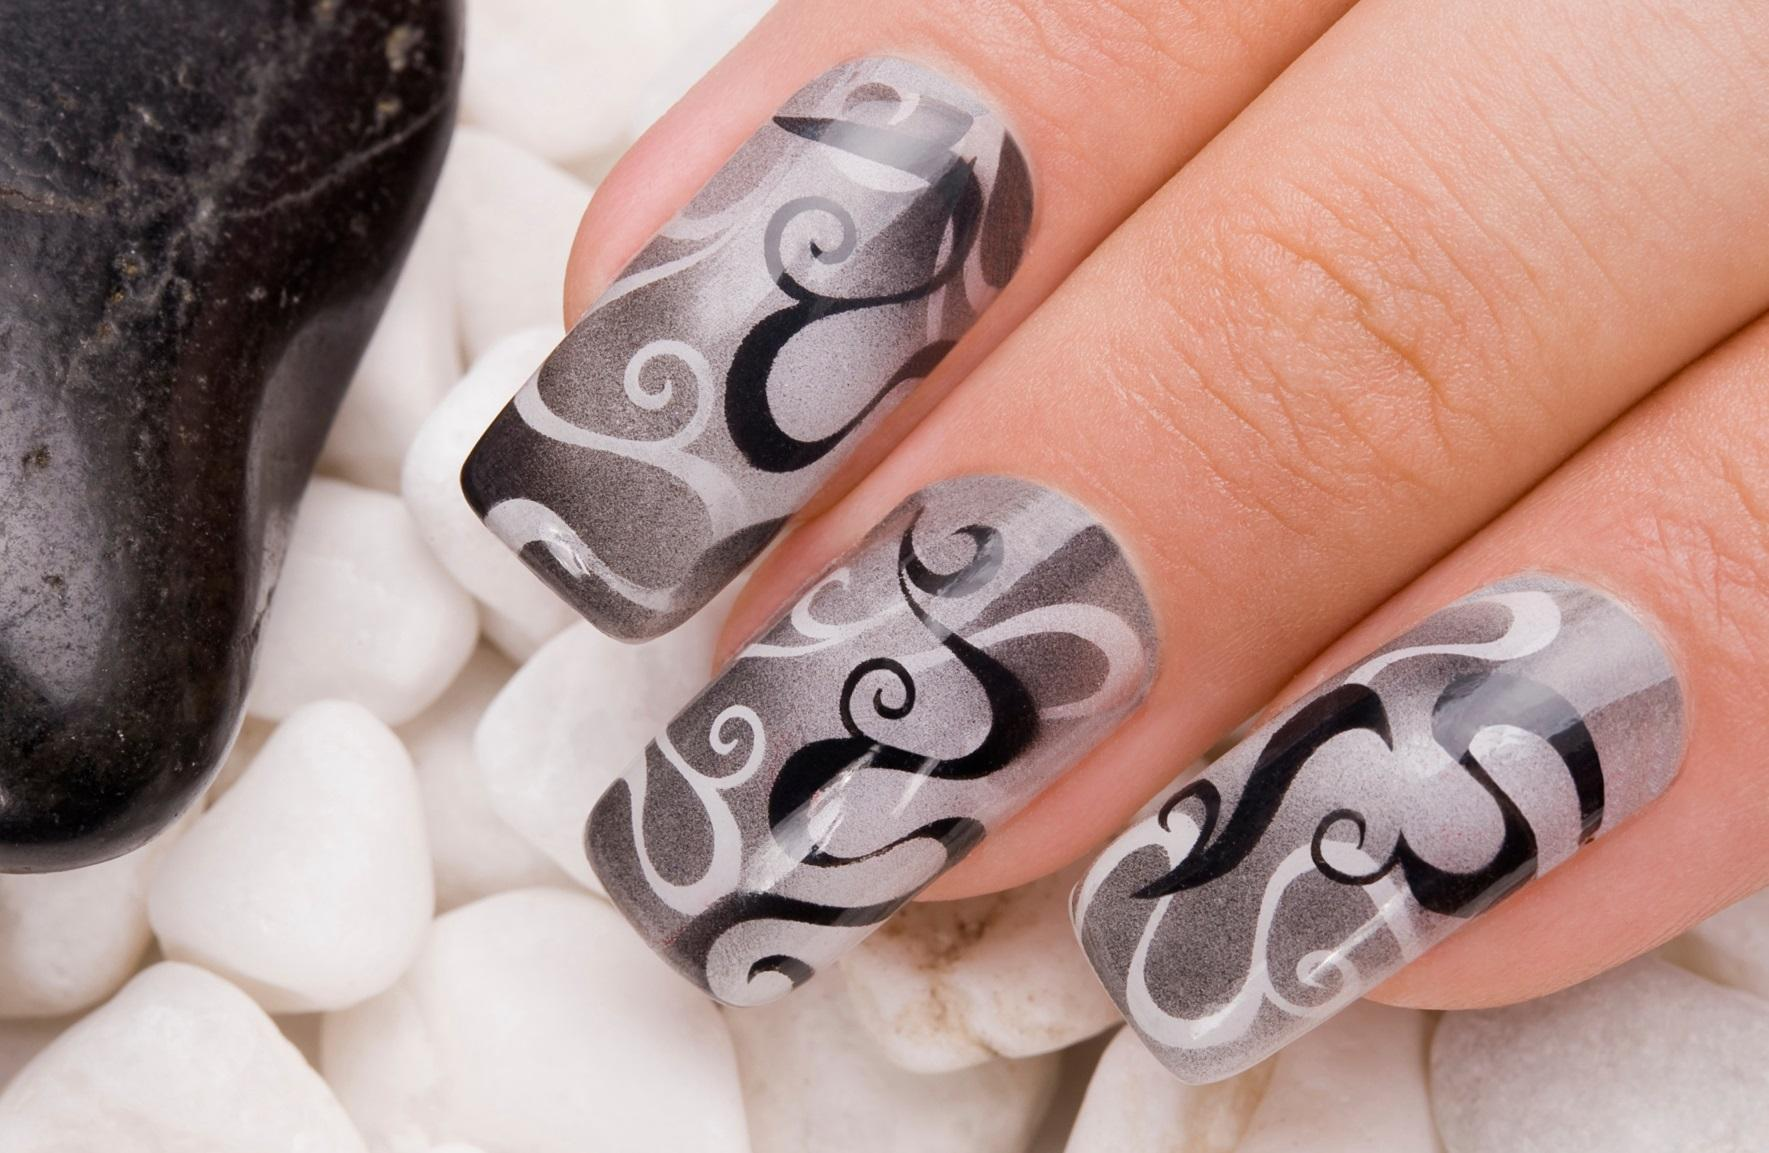 Красивый серый маникюр на наращенных ногтях